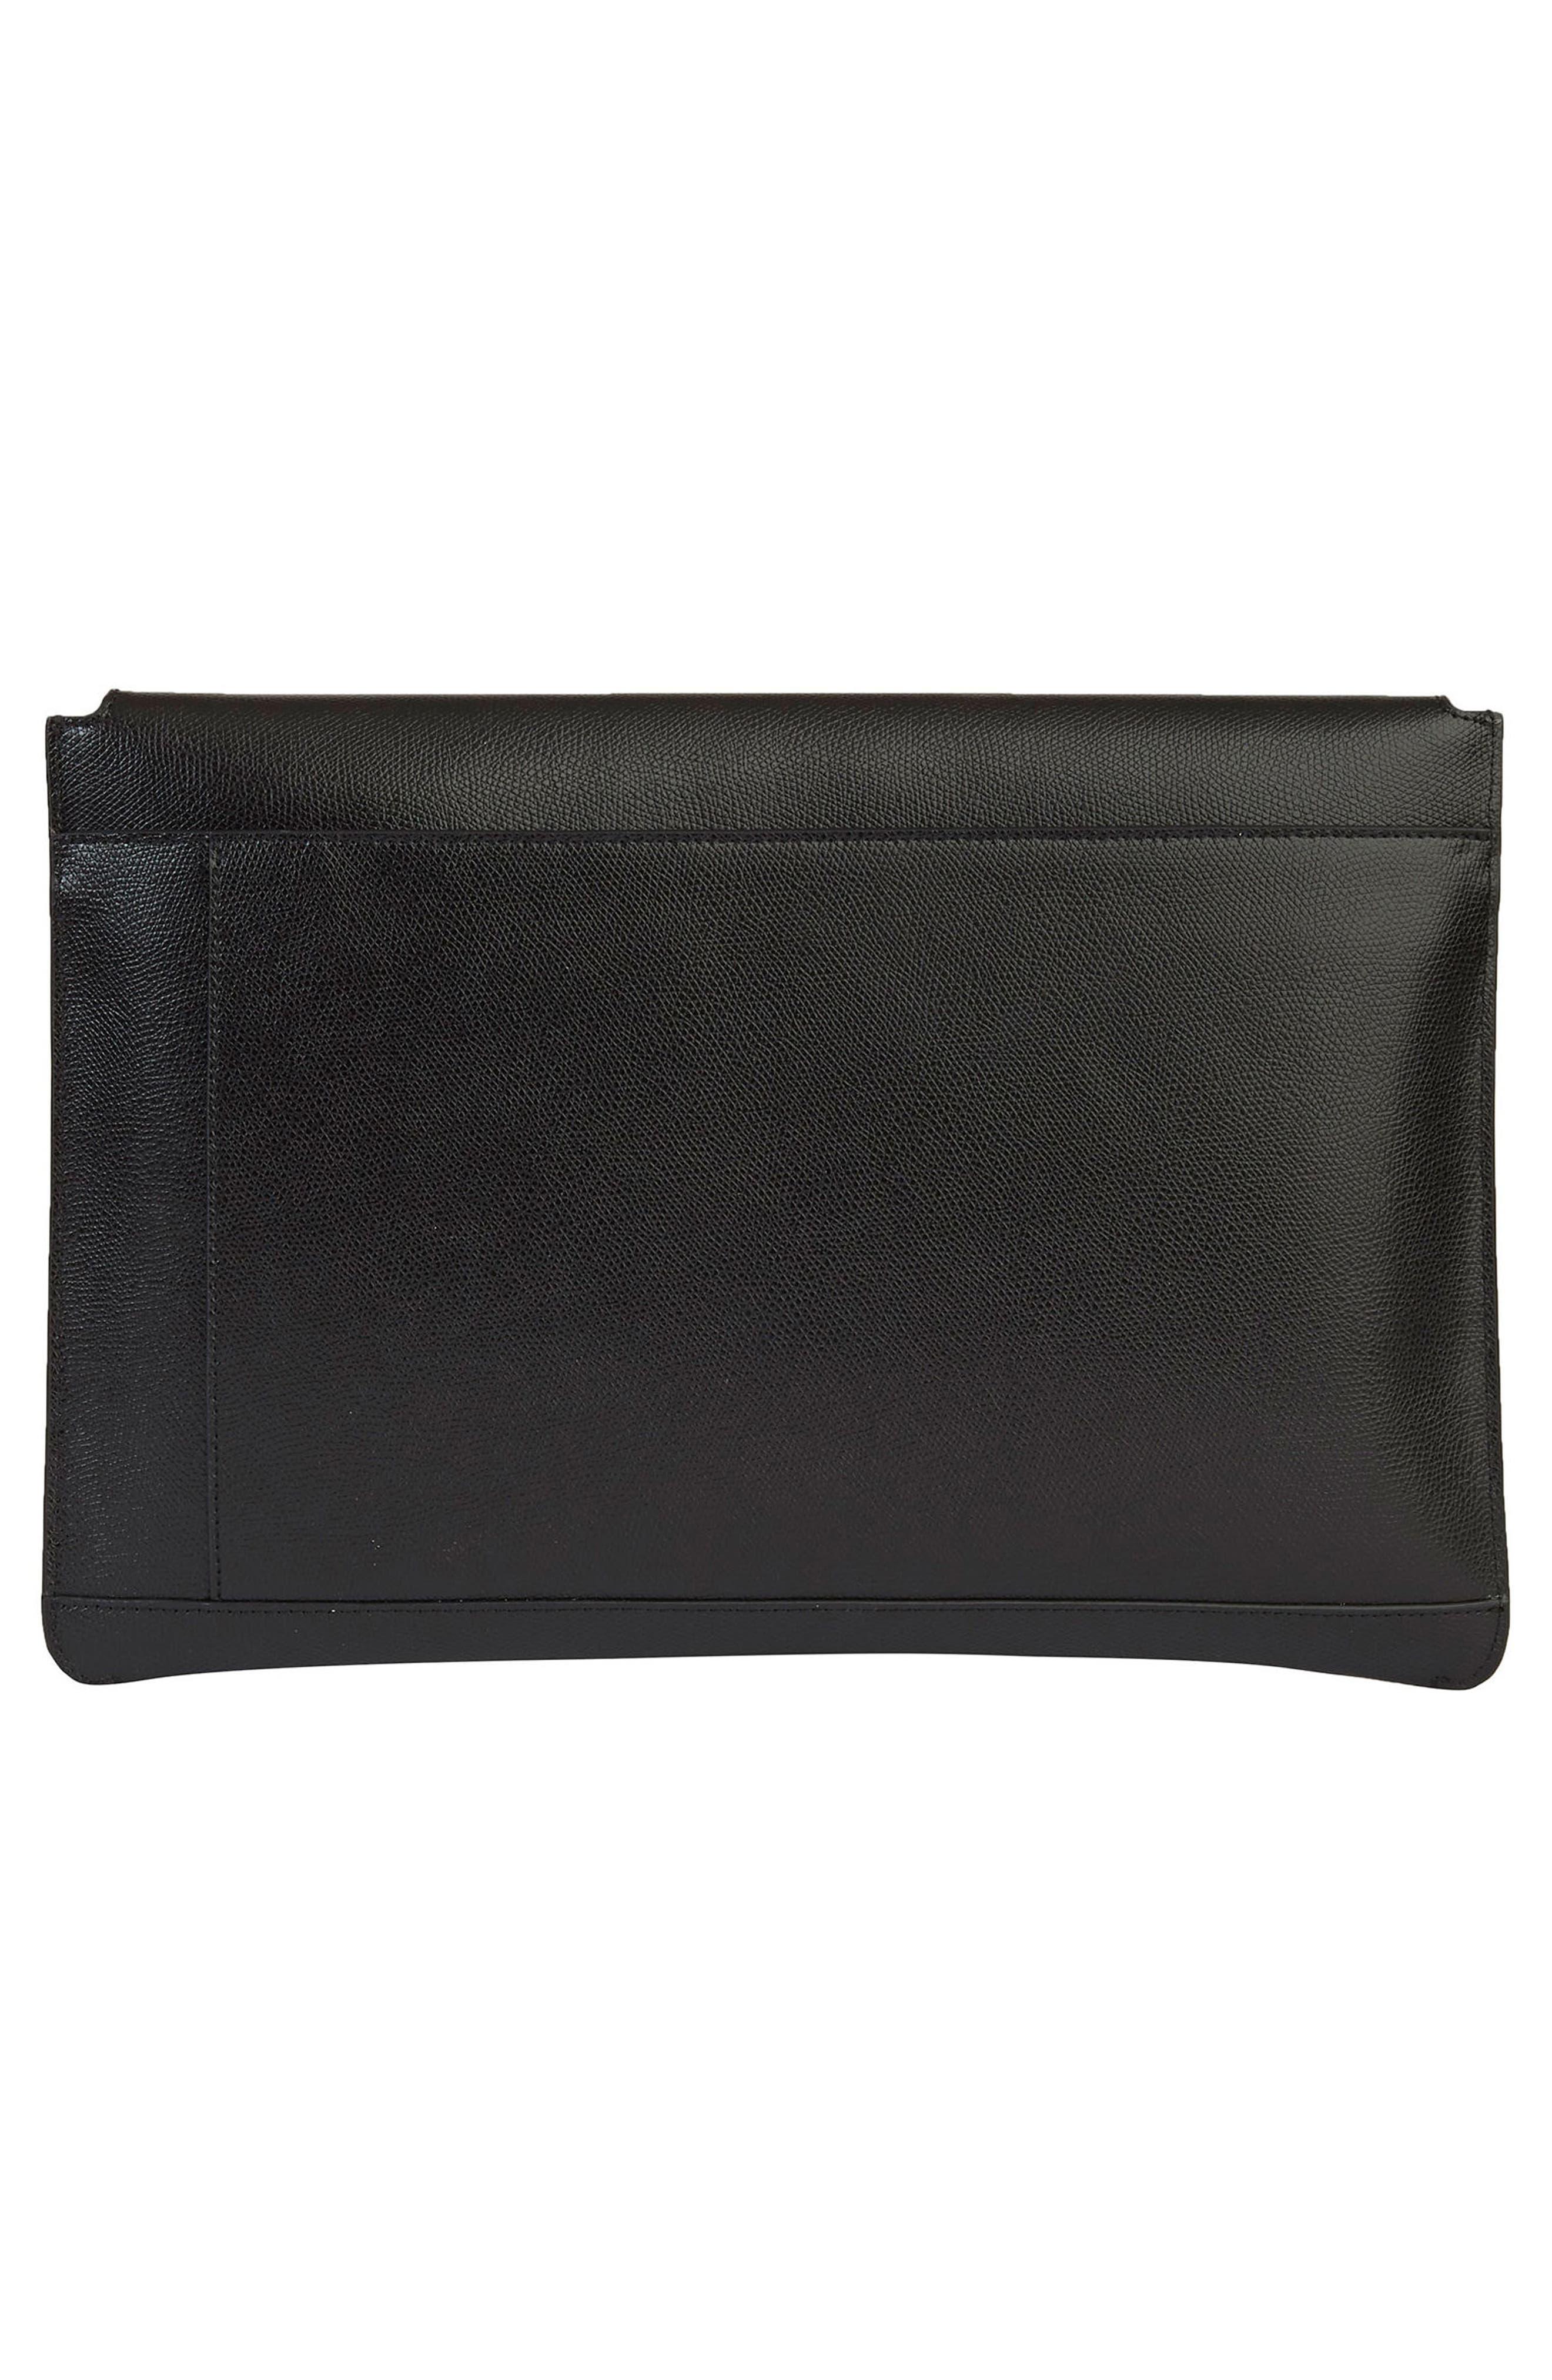 Pebbled Leather Envelope Clutch,                             Alternate thumbnail 2, color,                             001